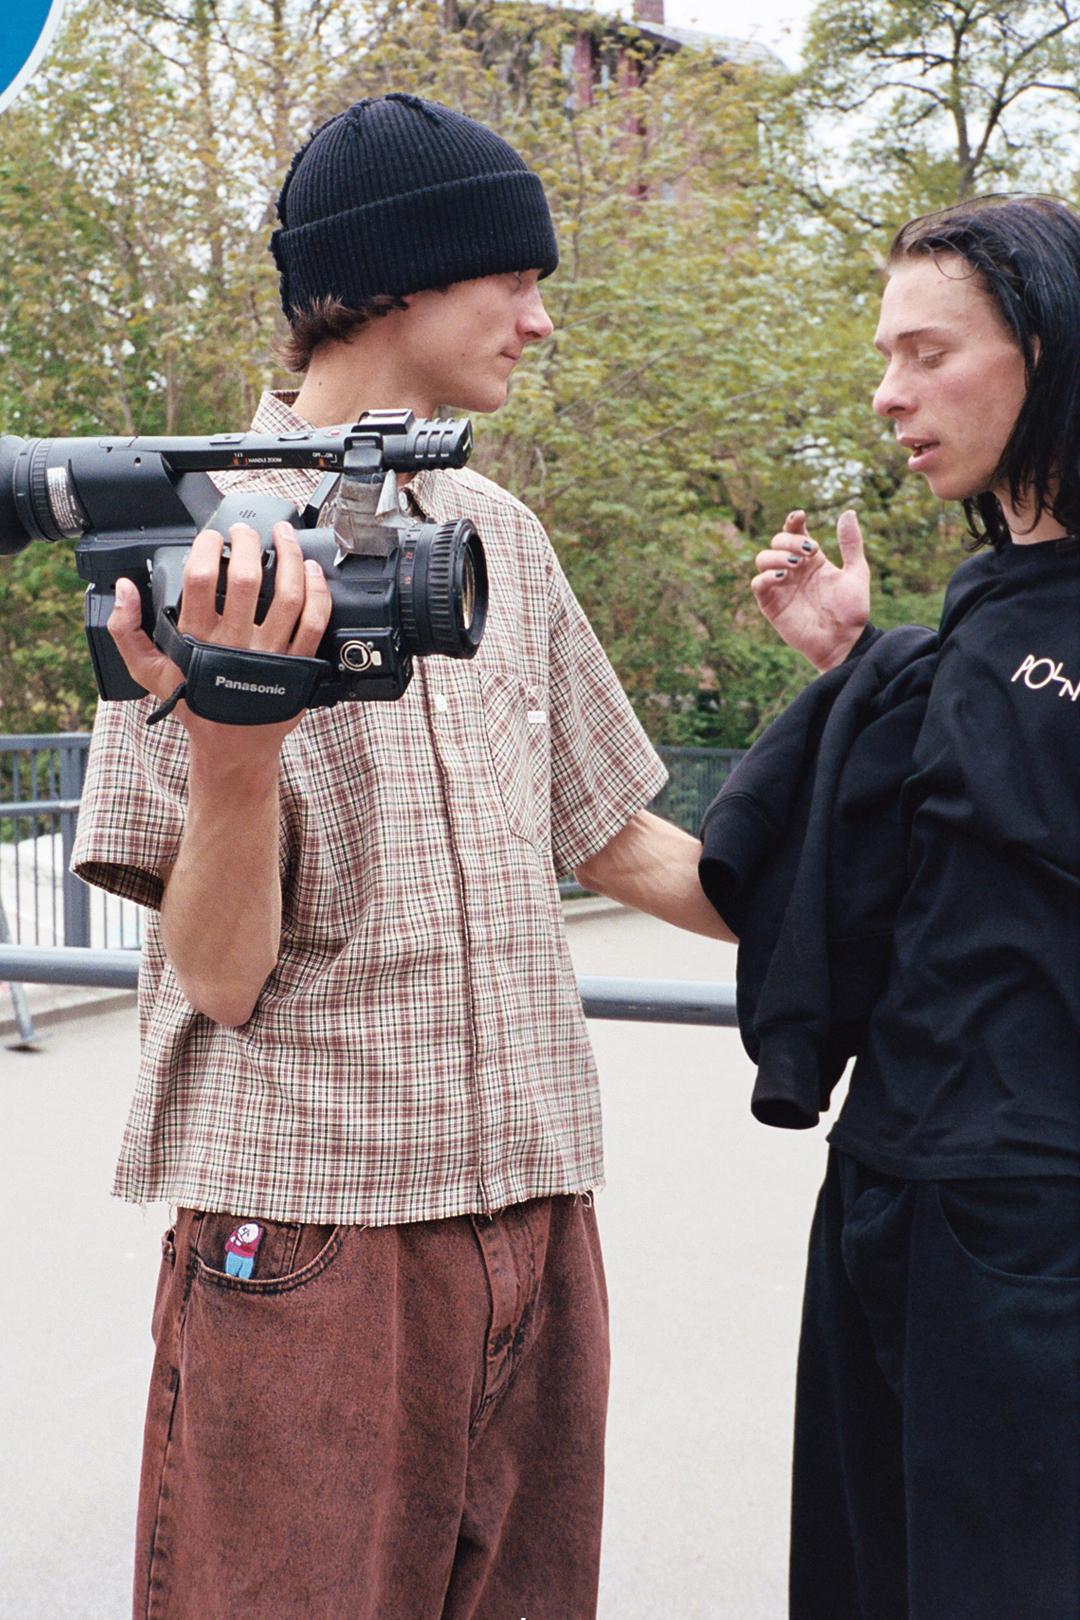 POLAR SKATE CO. 21 夏季系列发售-Blackwings官网-男士形象改造-穿搭设计顾问-男生发型-素人爆改